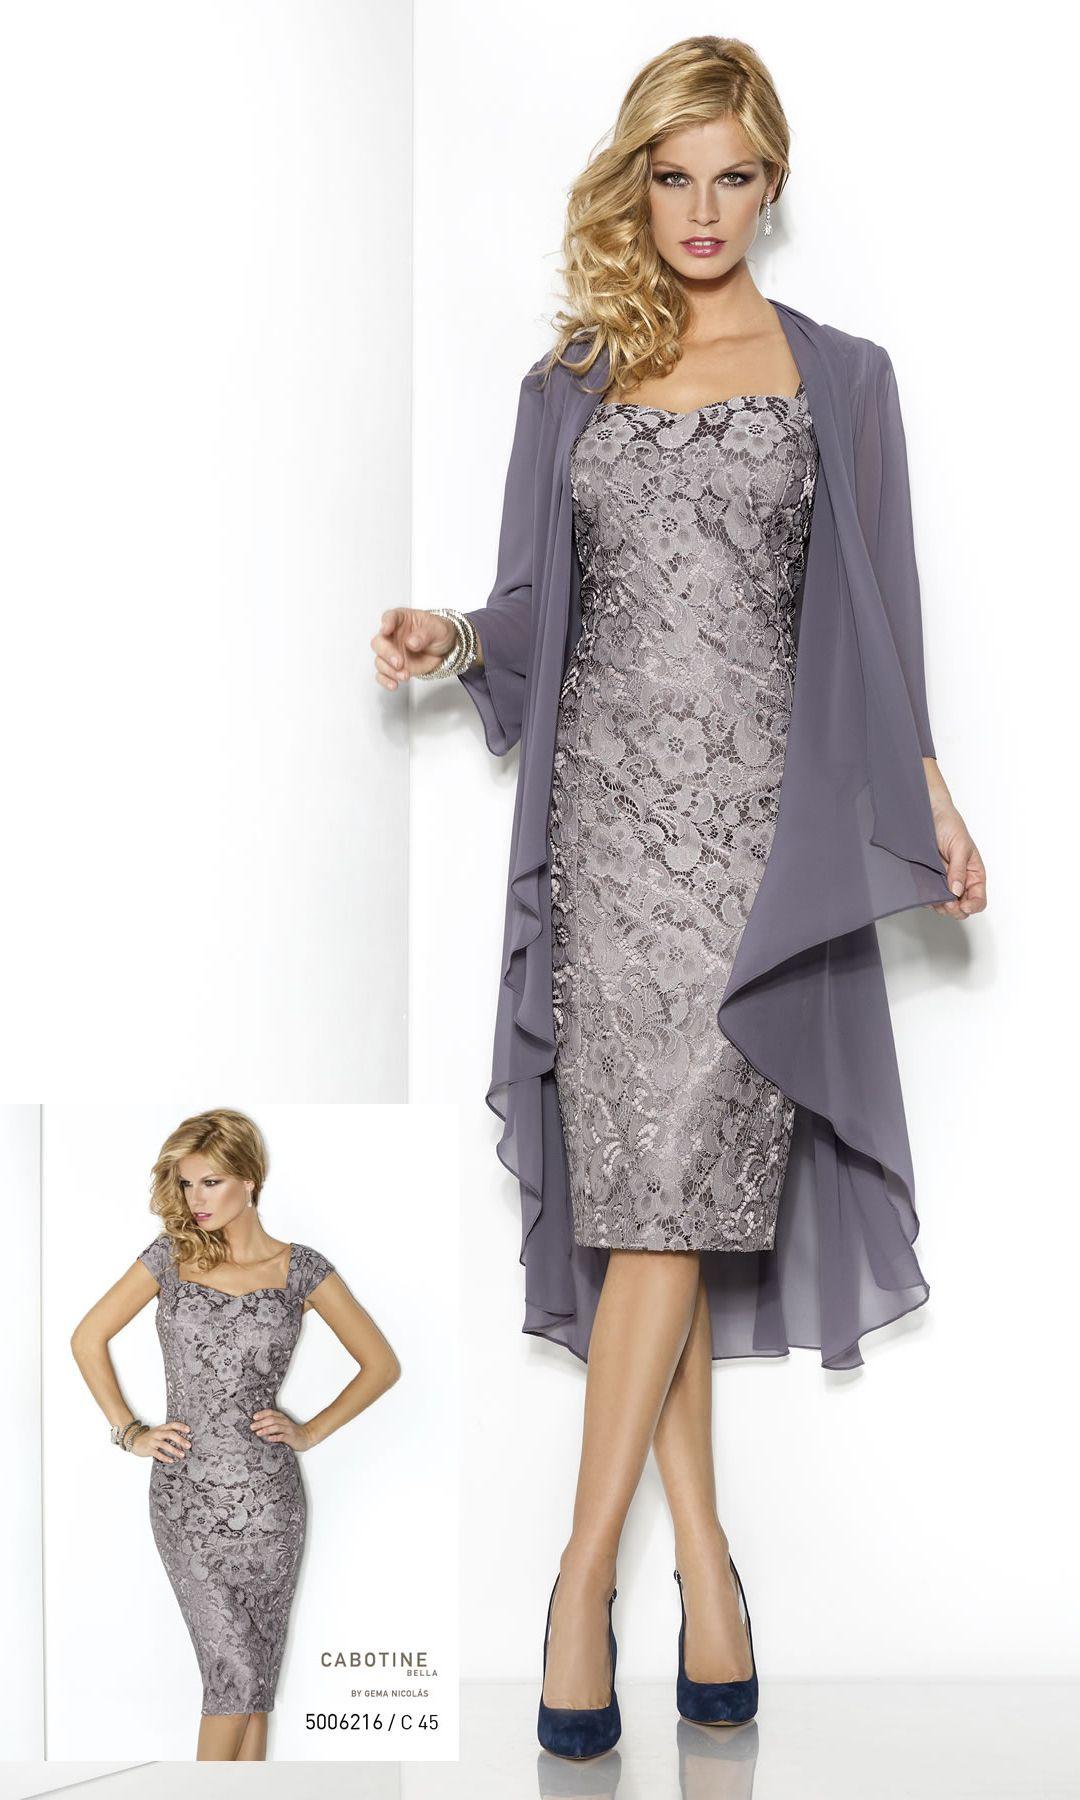 Cabotine Style 5006216 | fashion | Pinterest